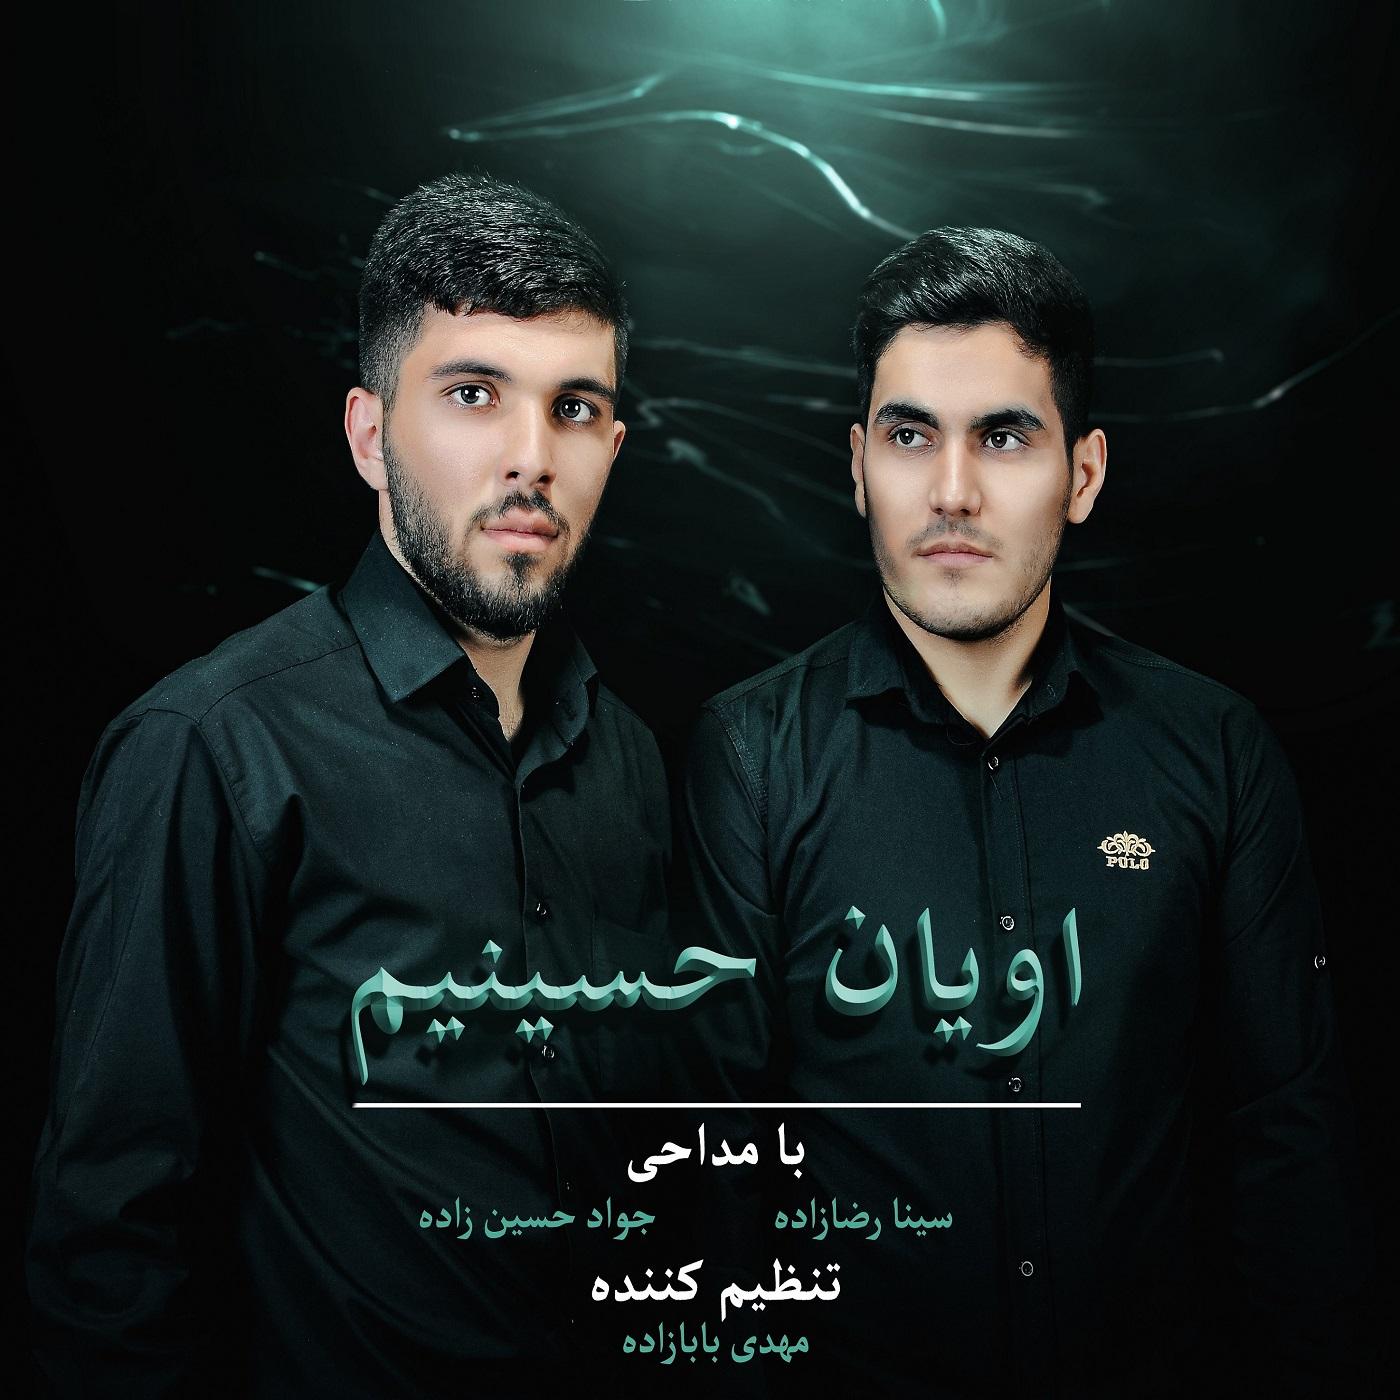 http://s10.picofile.com/file/8407261950/18Sina_Rezazadeh_Ft_Javad_Hosseinzadeh_Oyan_Hosseinim.jpg